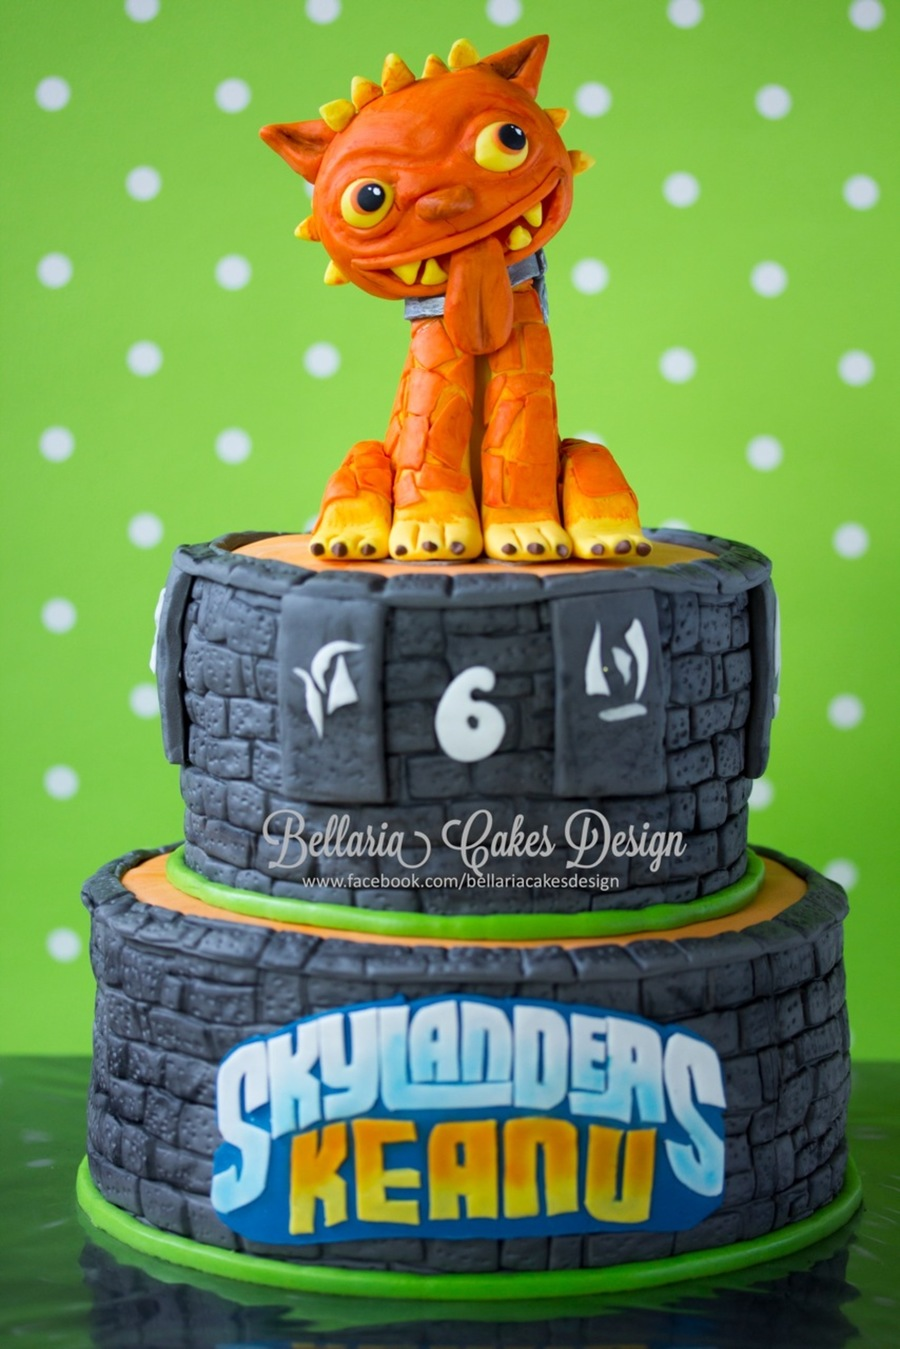 Skylander Hotdog Cake I Had A Lot Of Fun Making This Birthday Cake I